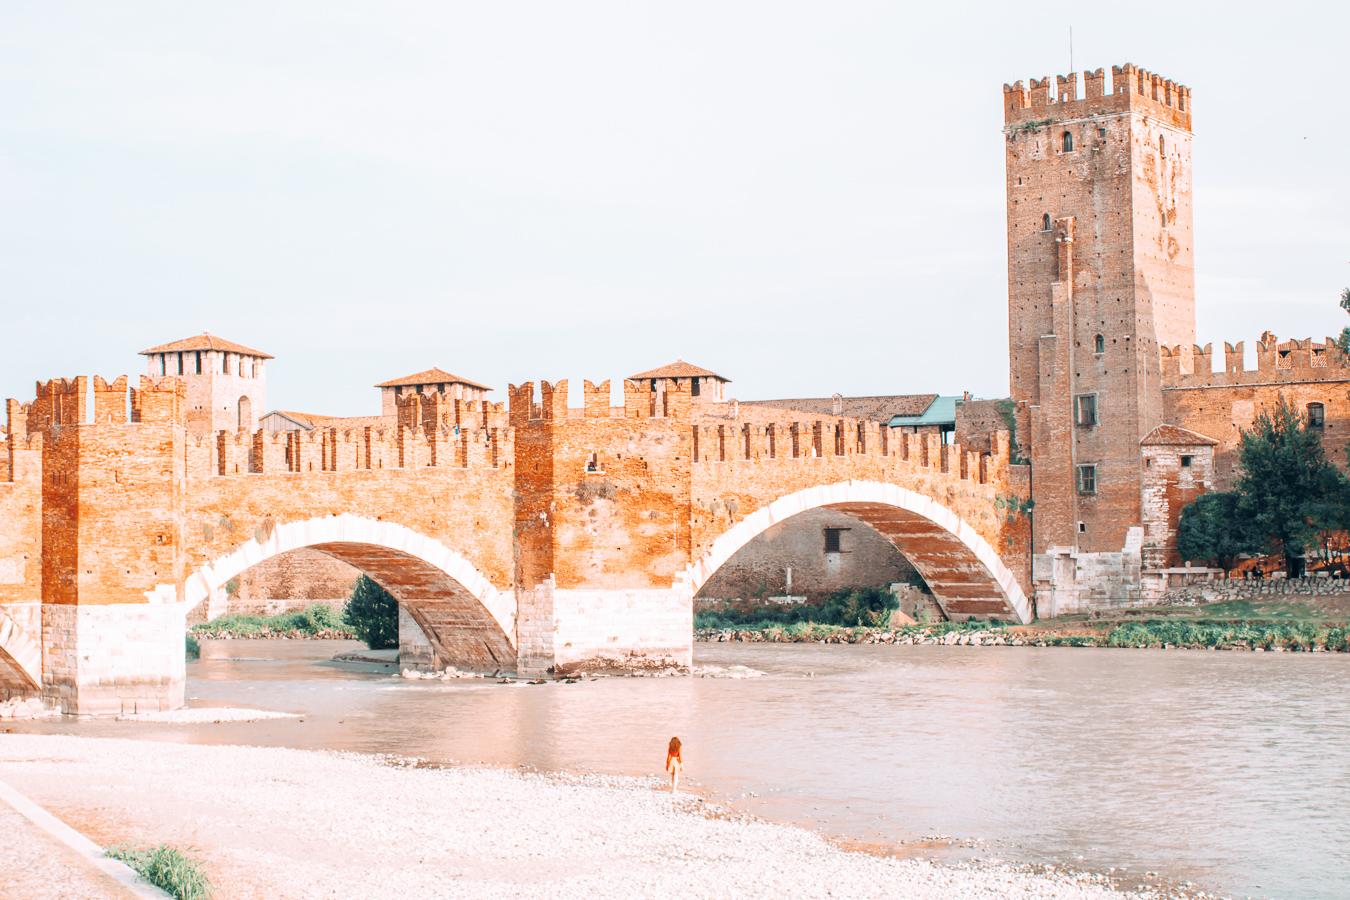 Castelvecchio Bridge and the river